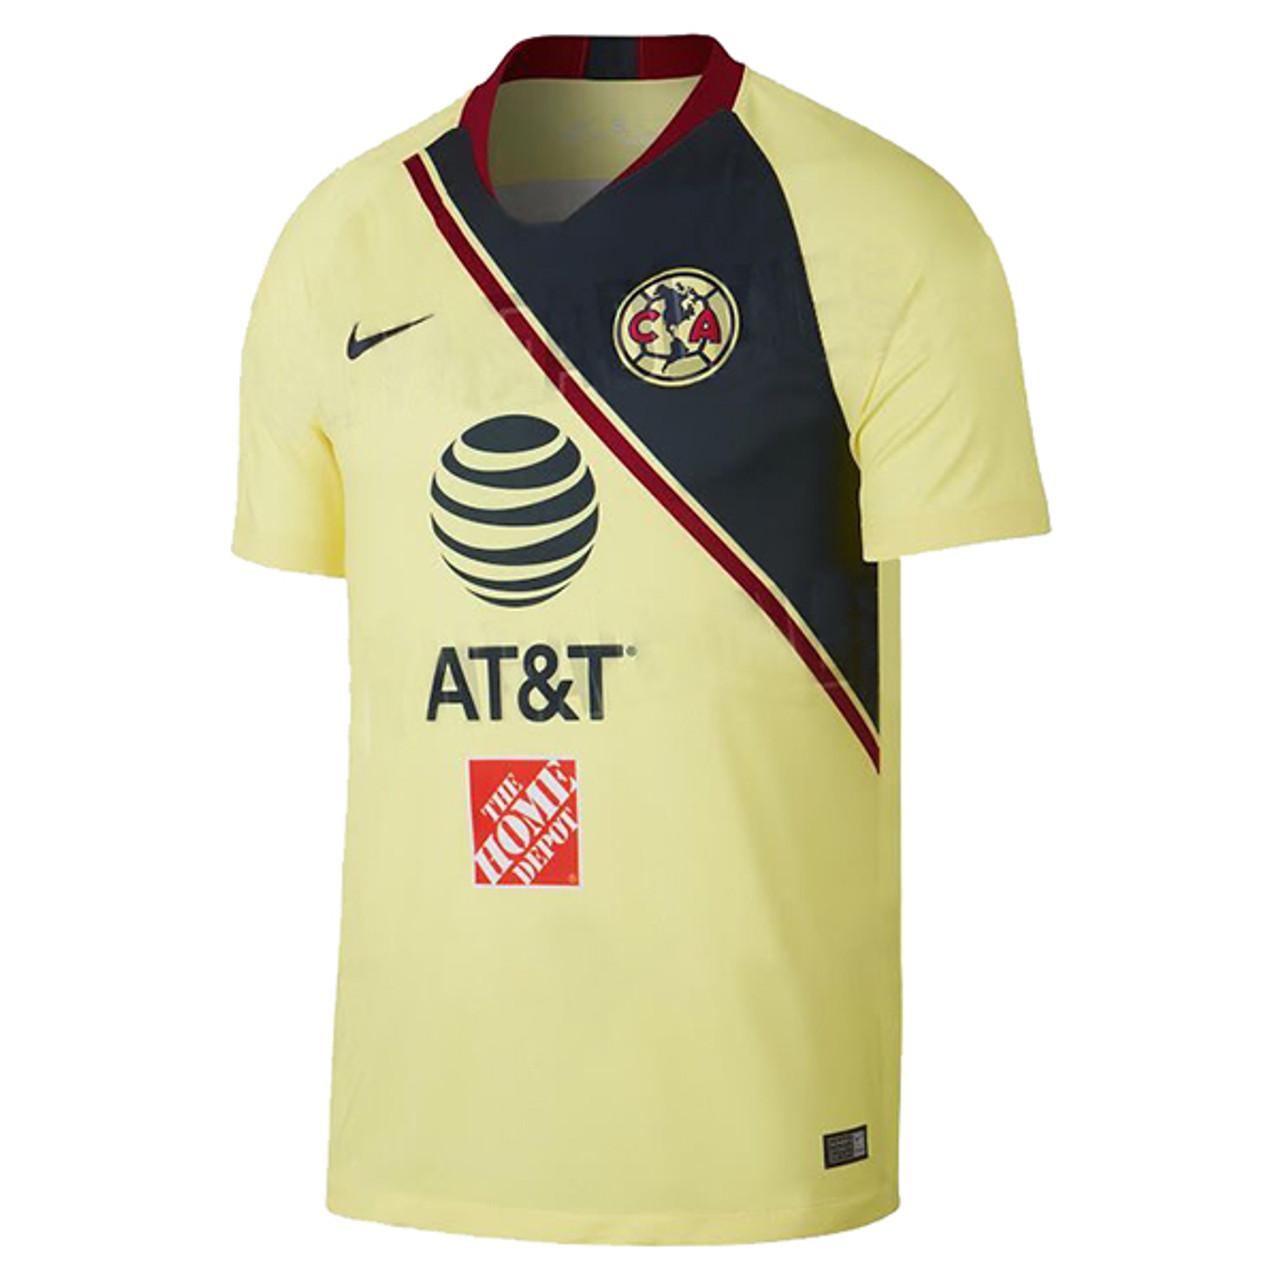 4deaa616a9 NIKE CLUB AMERICA 2019 HOME JERSEY - Soccer Plus